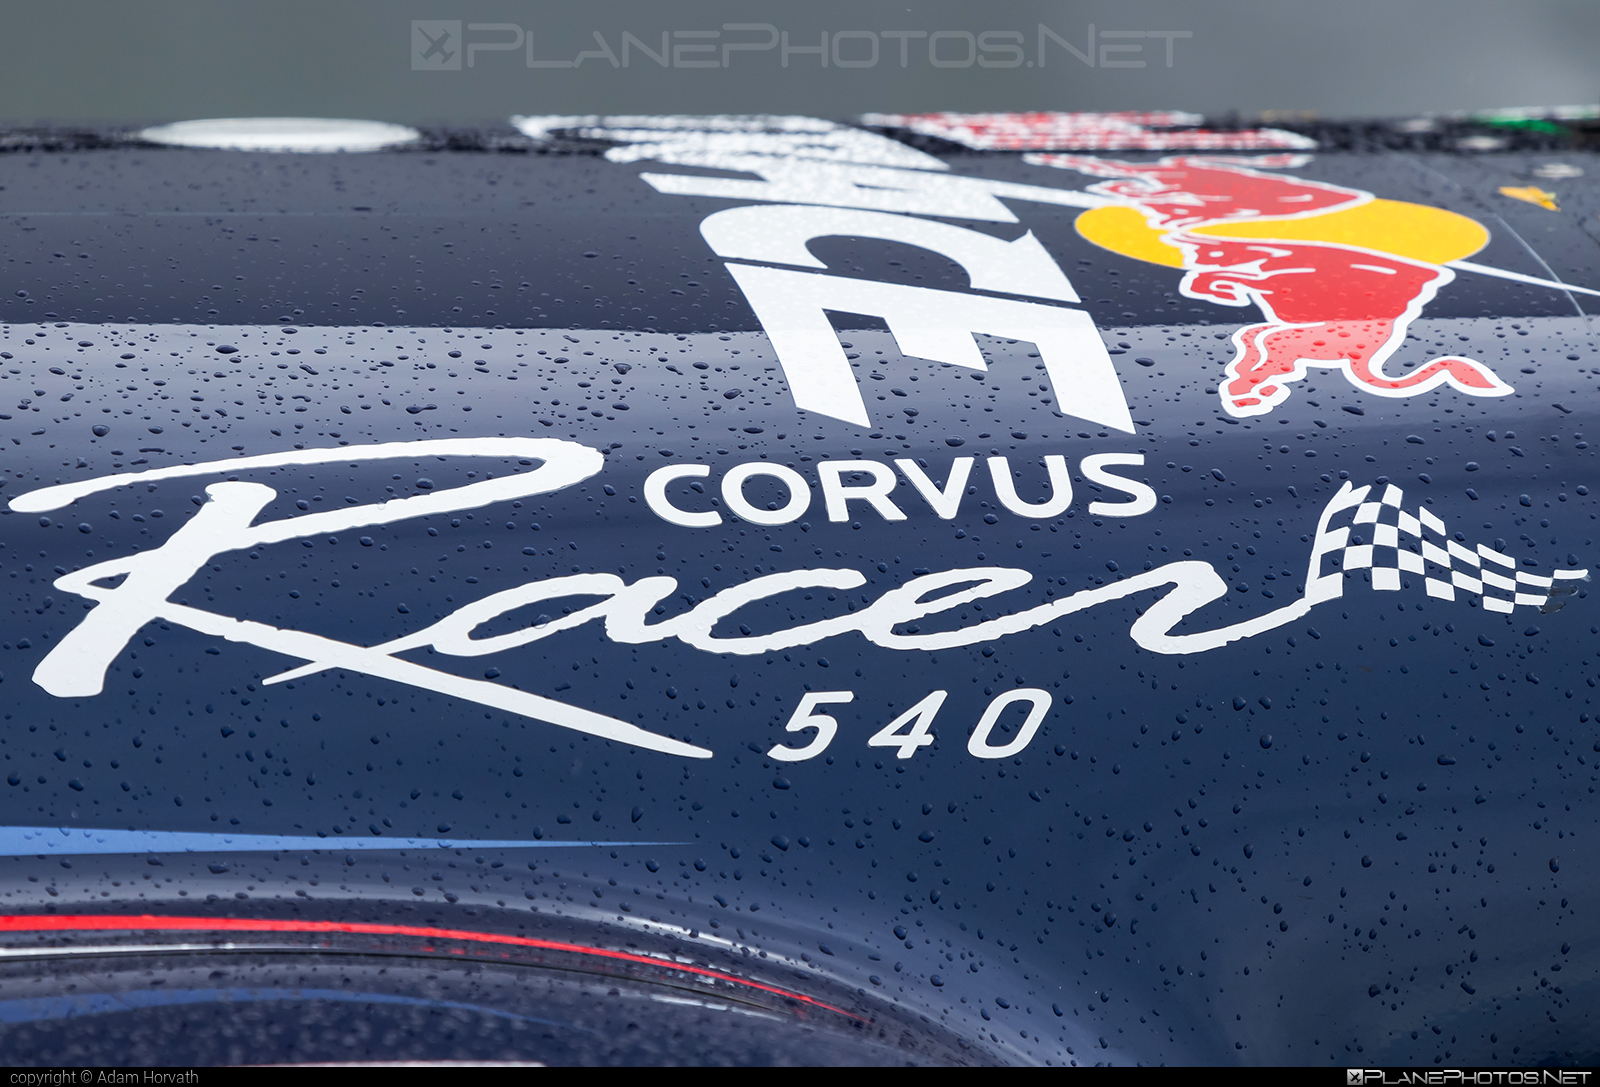 Corvus CA41 Racer - N806CR operated by Private operator #corvusaircraft #corvusracer #peterbesenyei #redbullairrace #redbullairracebalaton